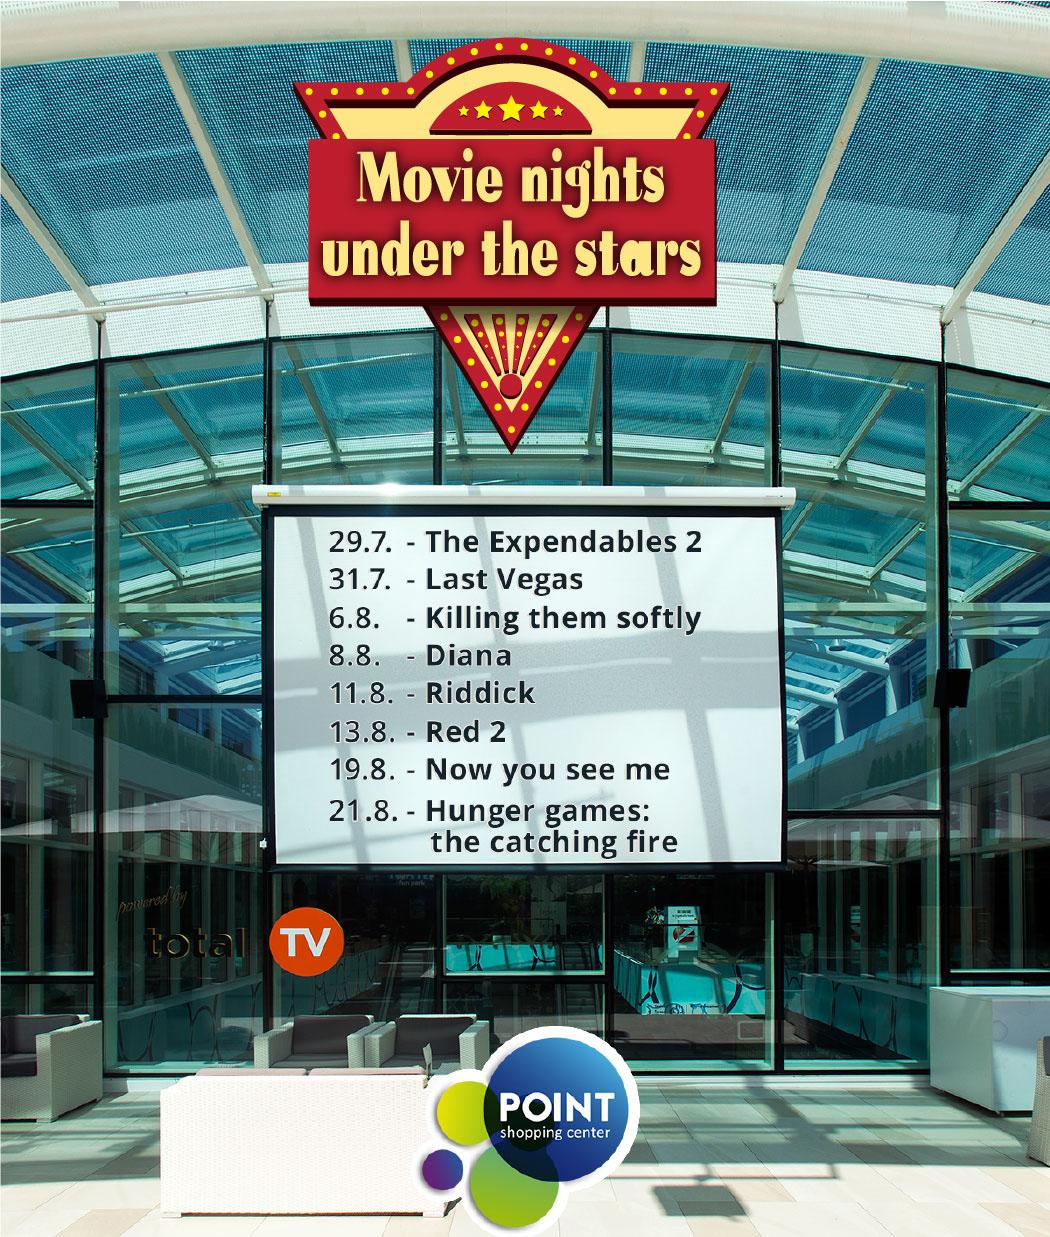 Movie nights under the stars